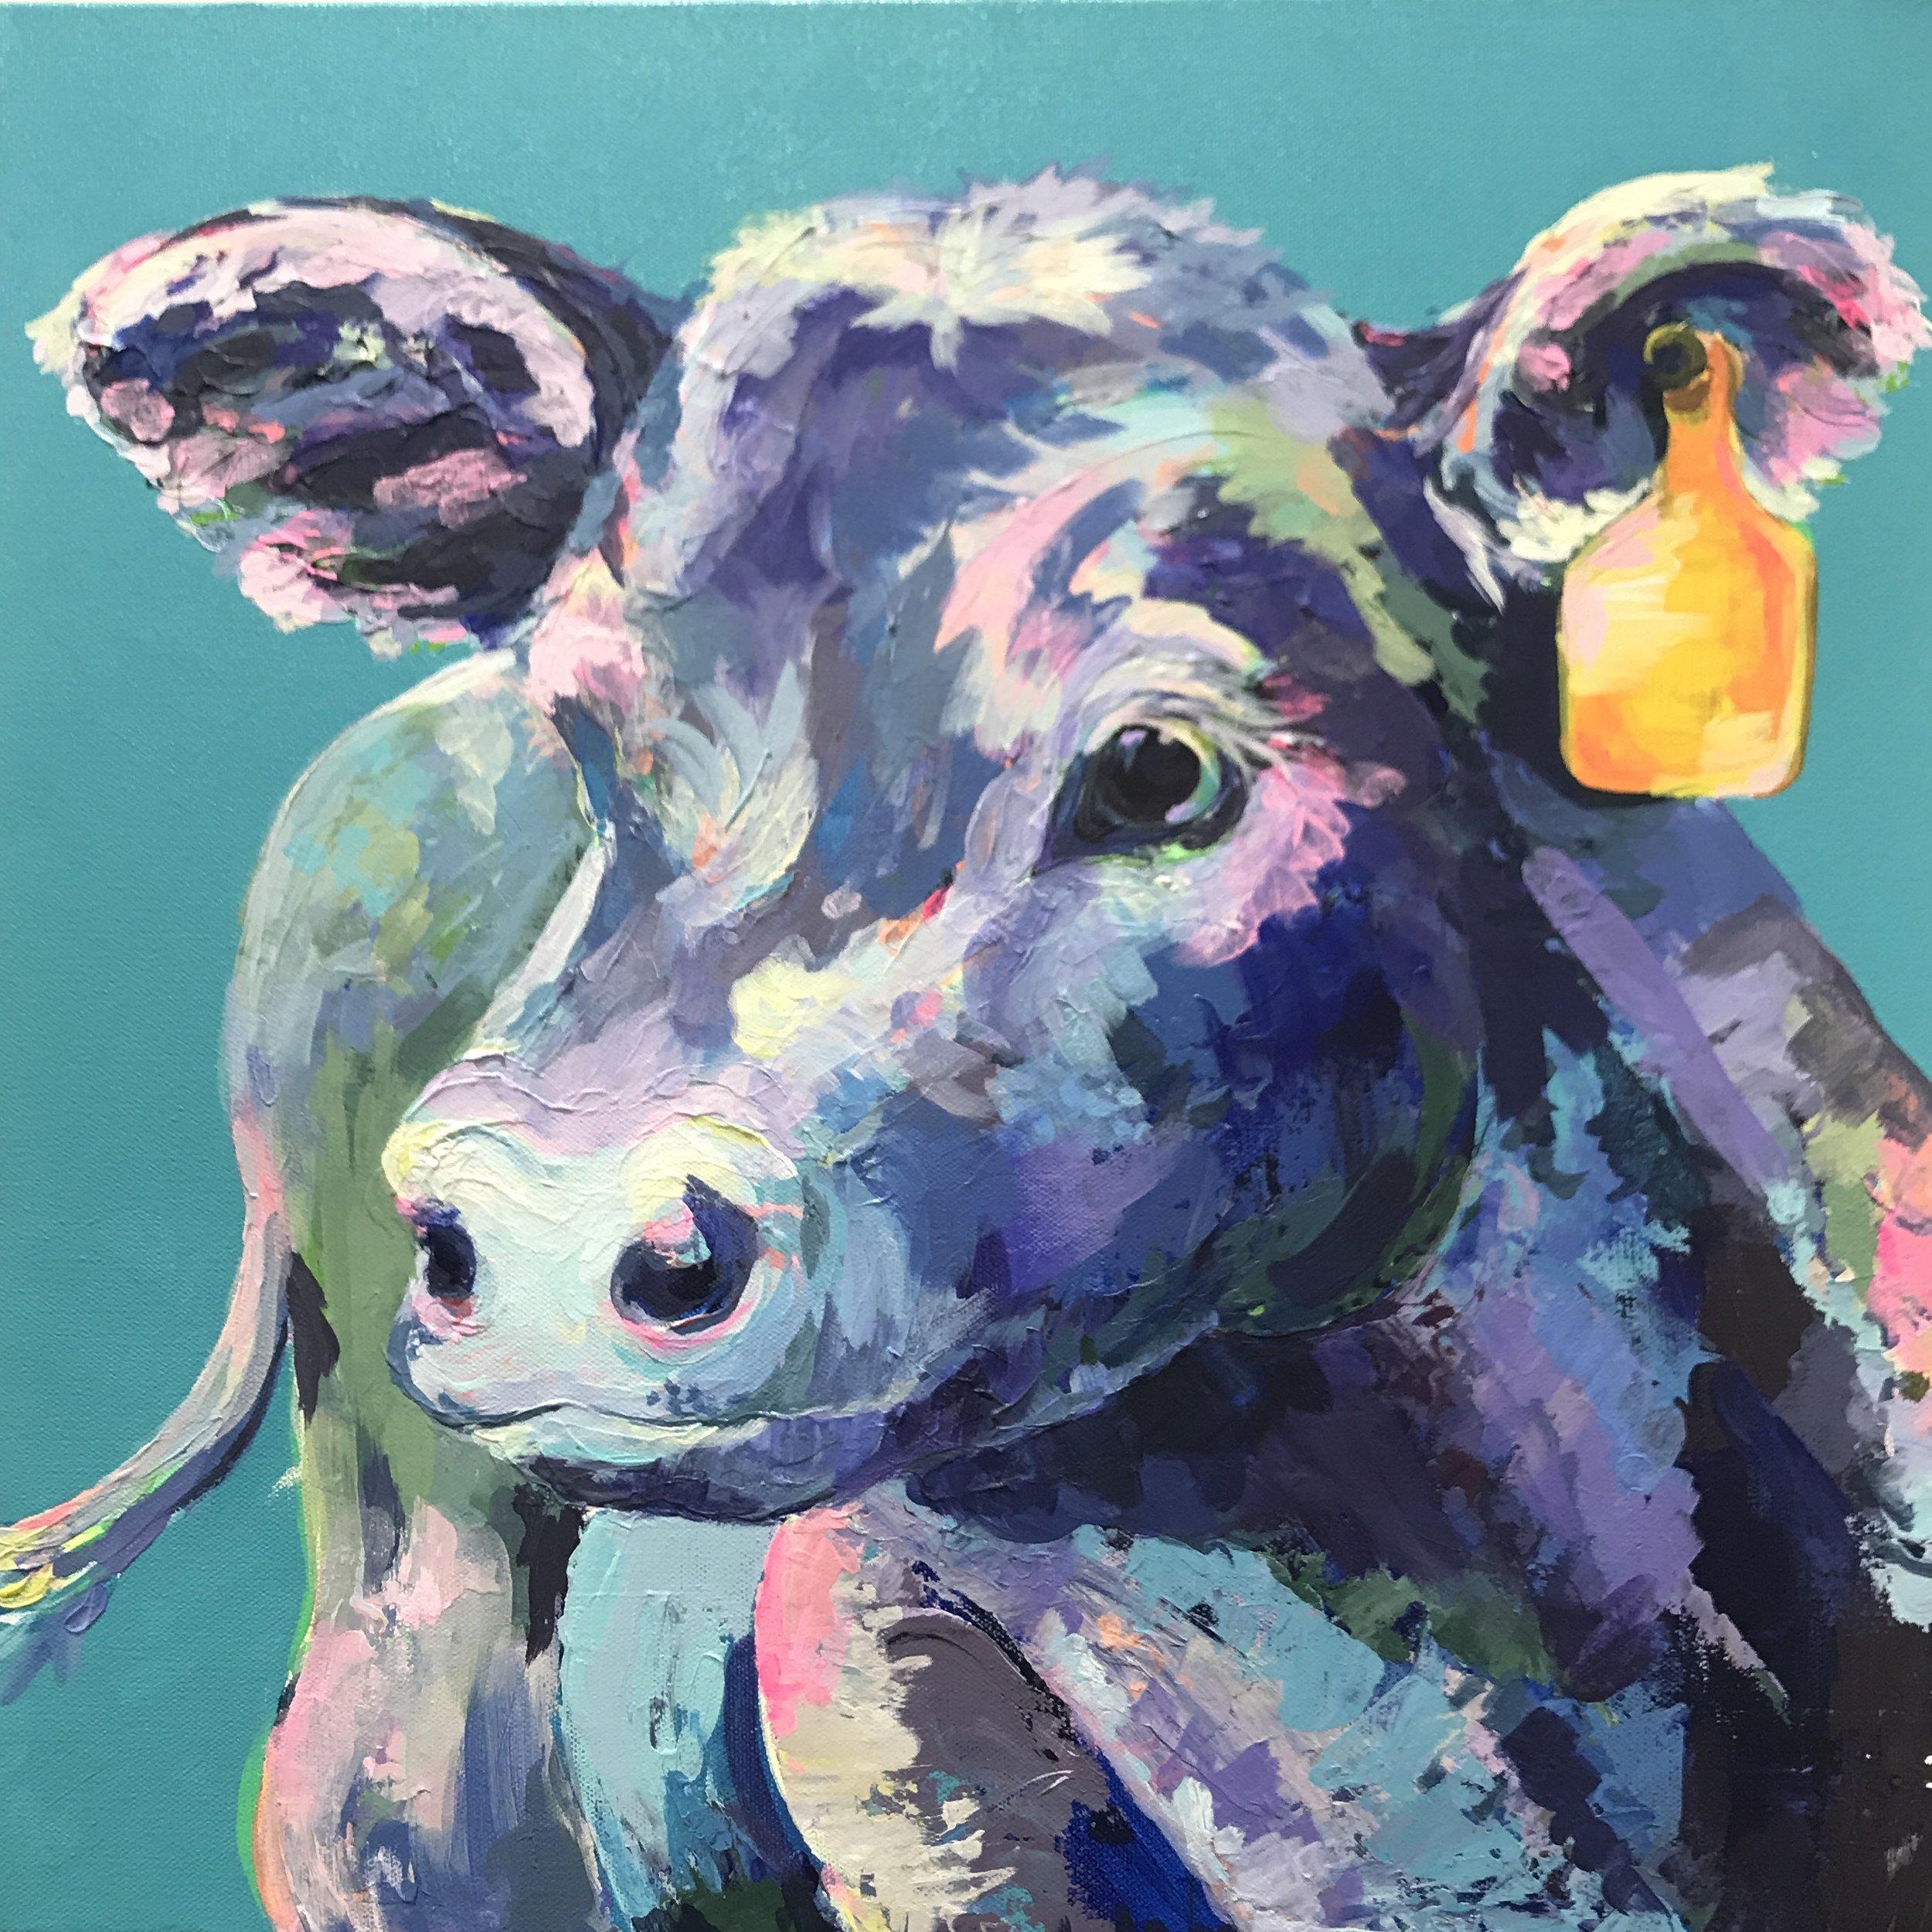 DWenarchuk - Blue Moo 20x20 Acrylic on Canvas.jpeg